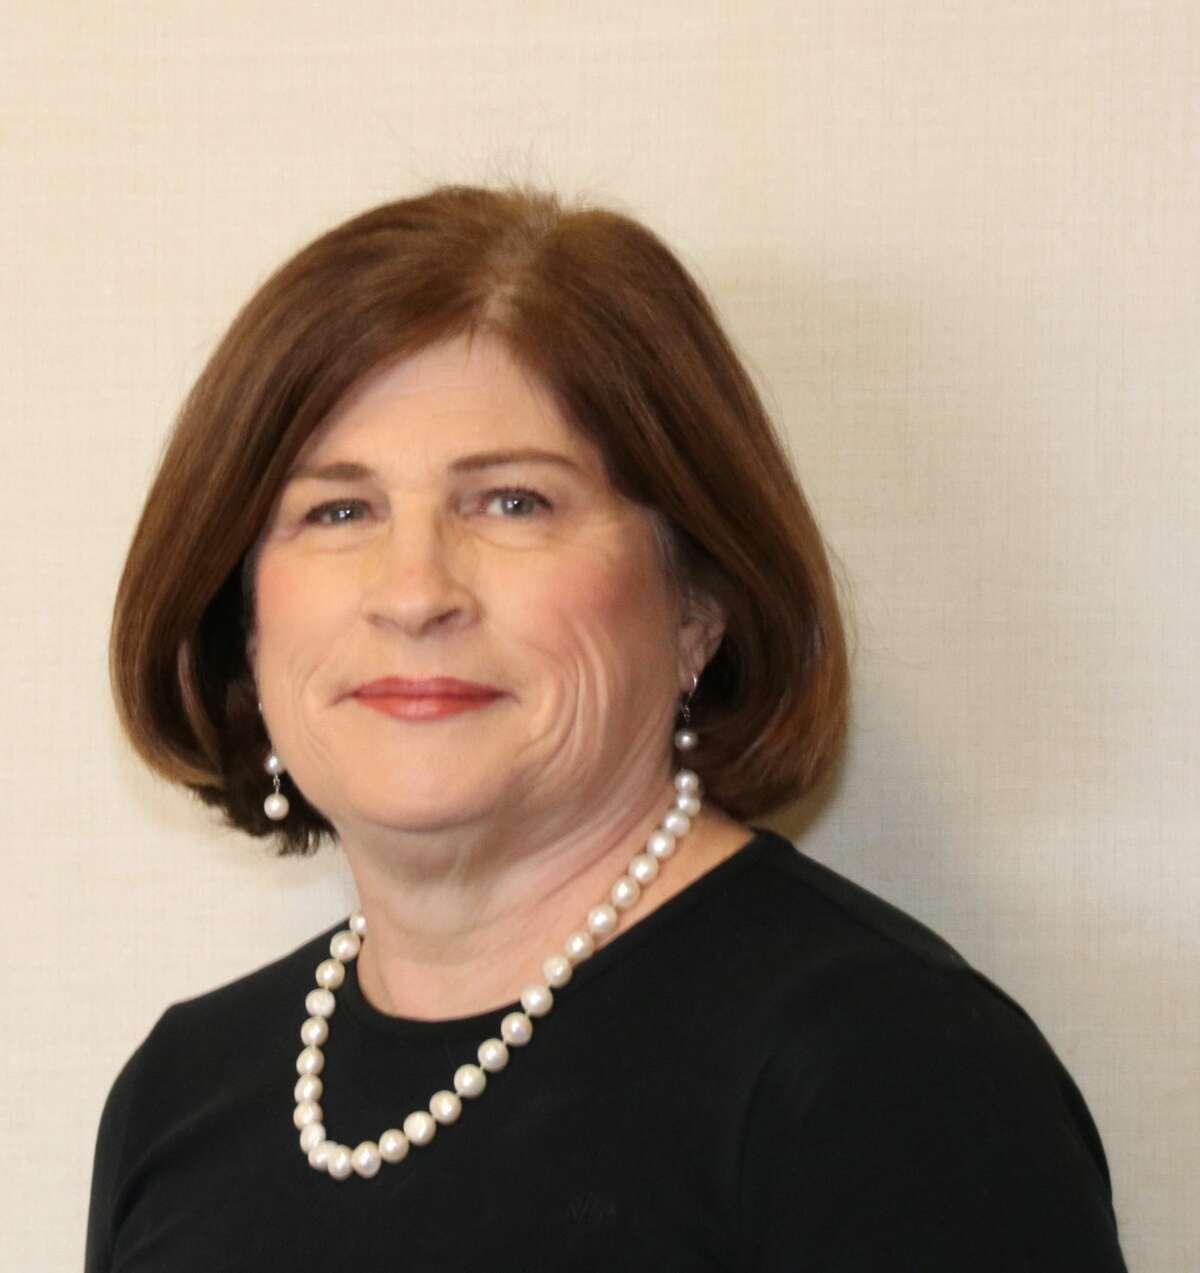 Deborah Ullman of Litchfield, retired CEO, YWCA of the Hartford Region